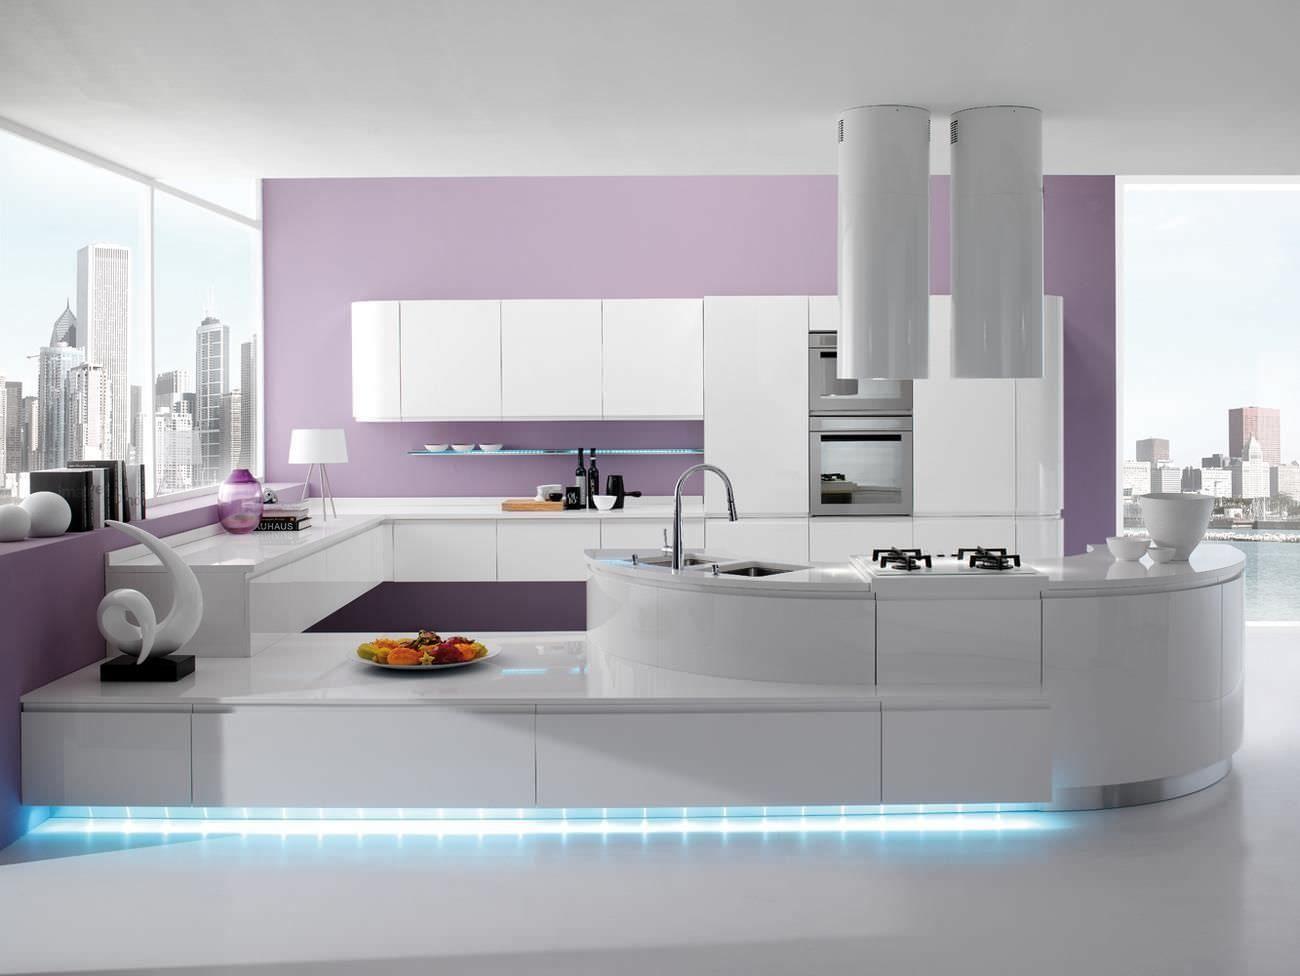 Torchetti Cucine Moderne.Cuisine Contemporaine En Bois Avec Ilot Laquee Seven